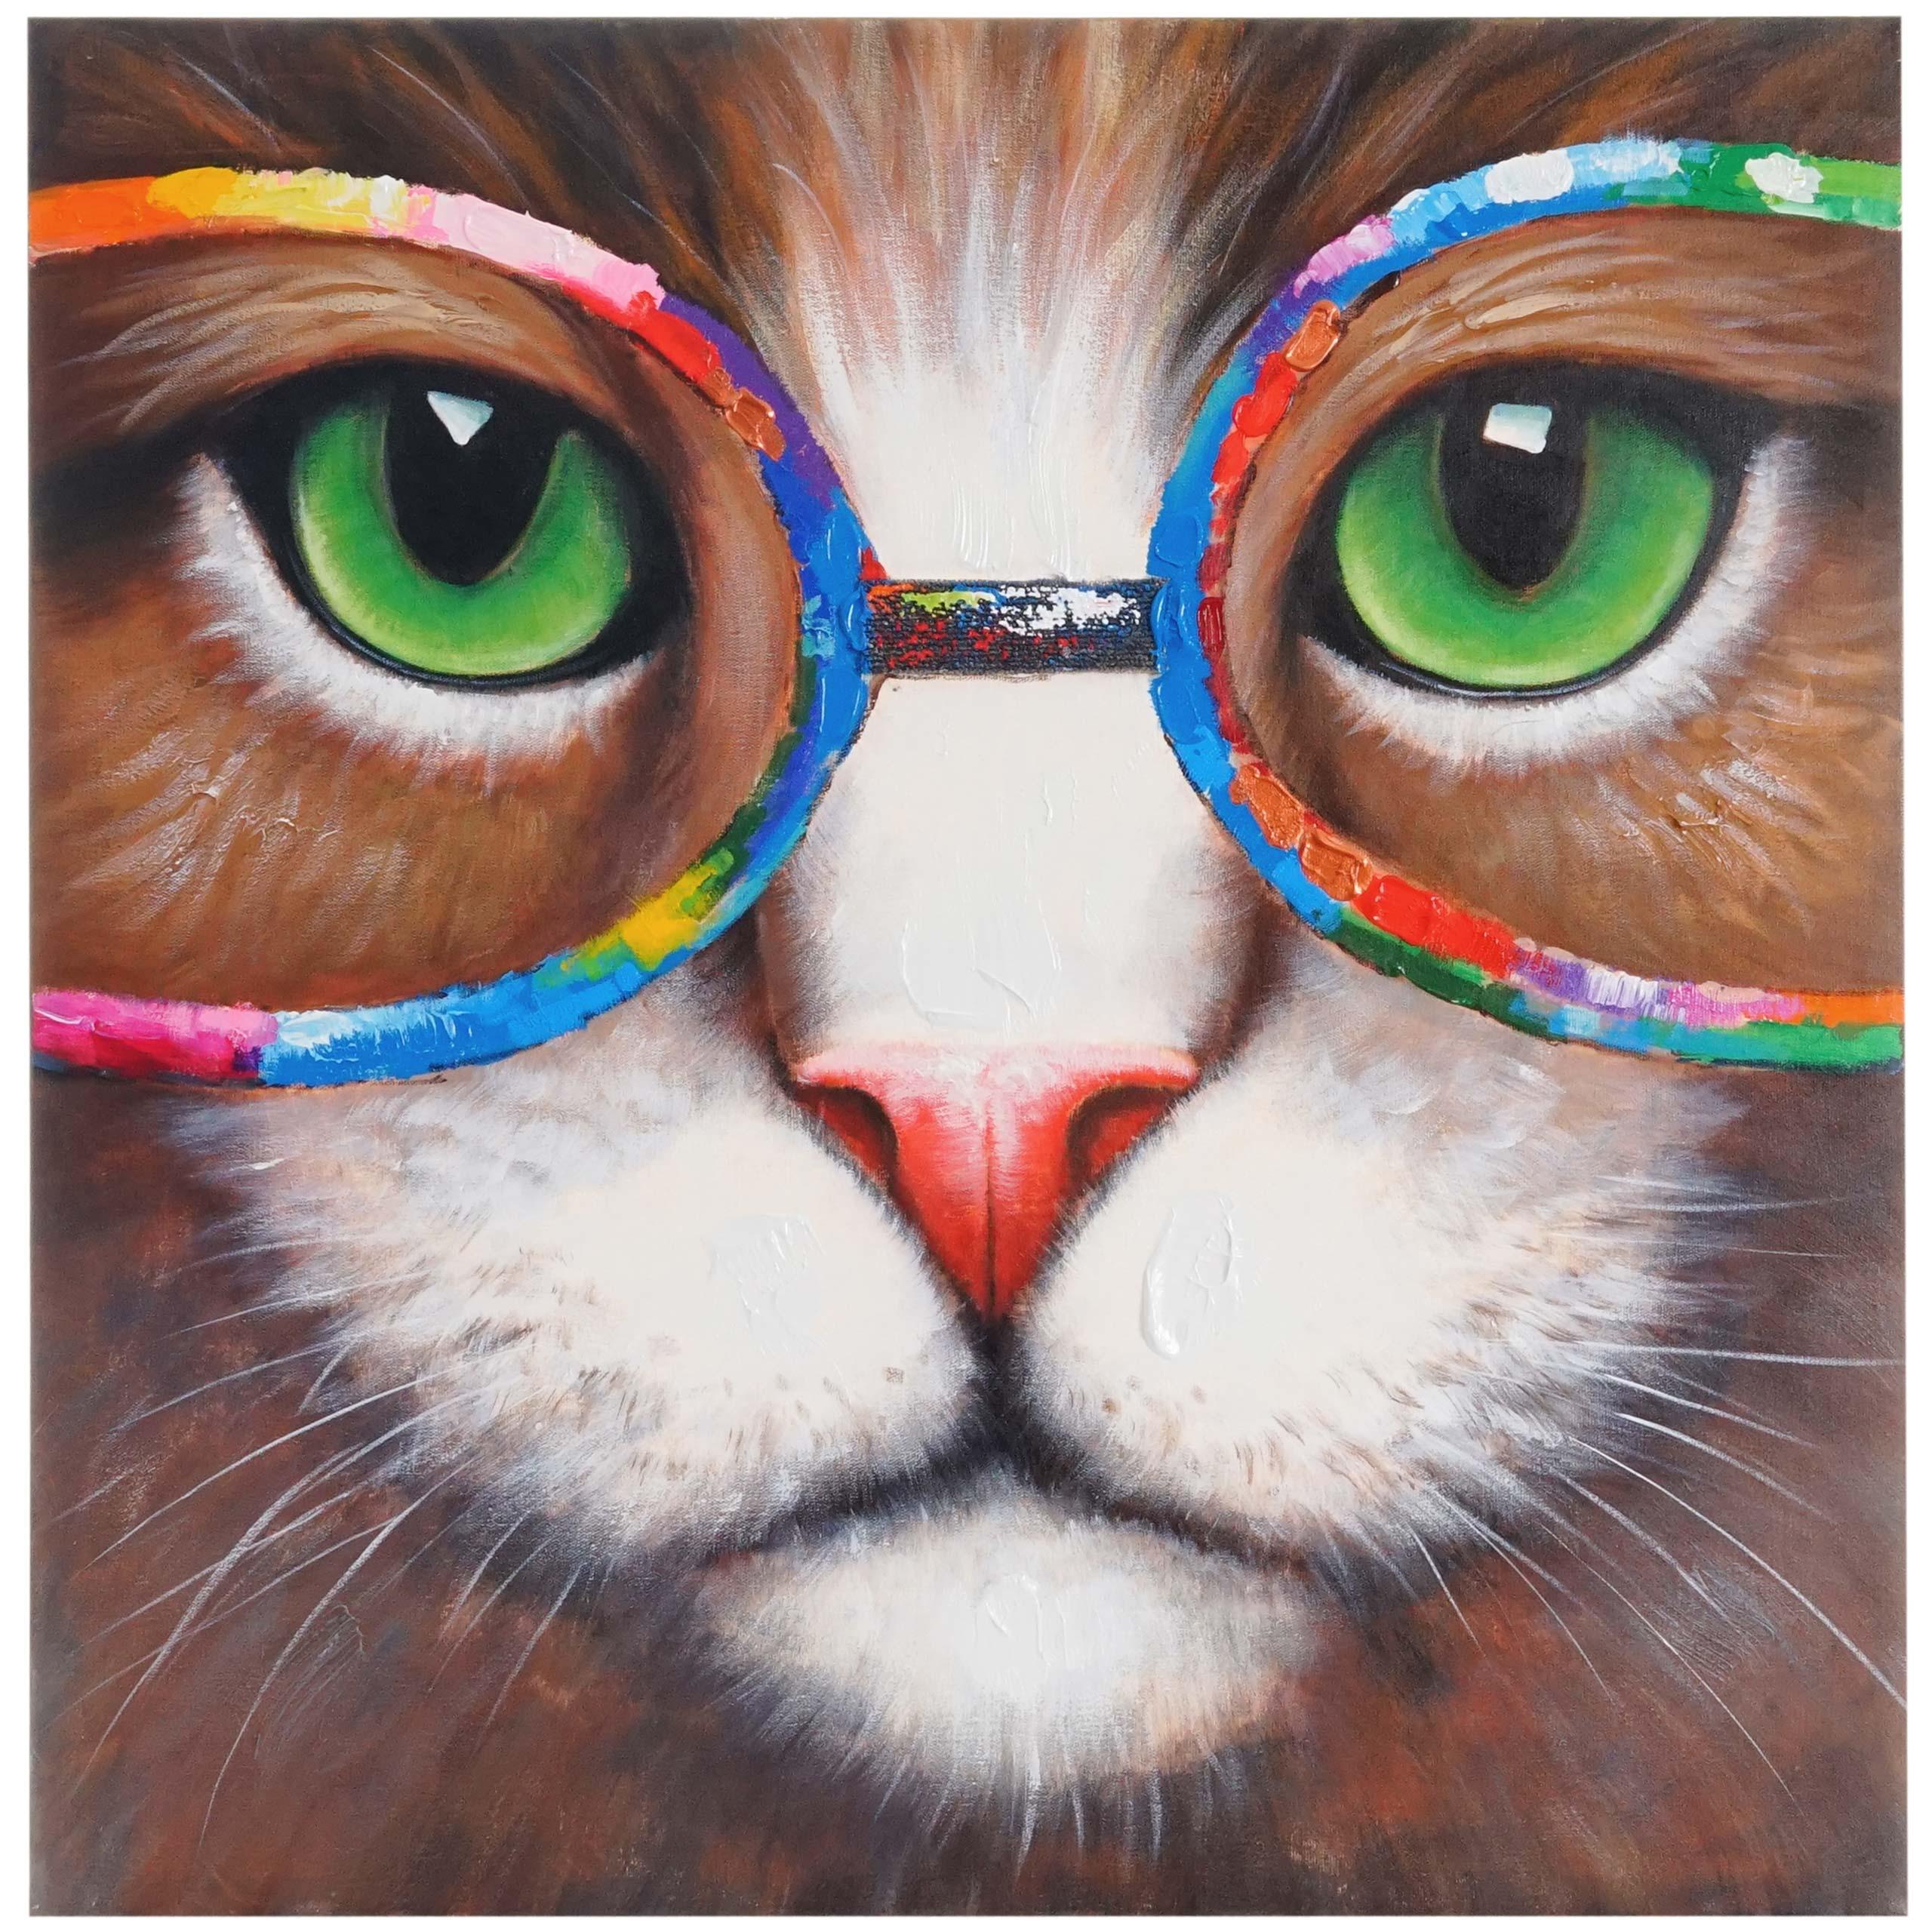 Mendler Ölgemälde Hipster Katze, 100% handgemaltes Wandbild 3D-Bild Gemälde XL, 90x90cm ~ Variantenangebot 44725